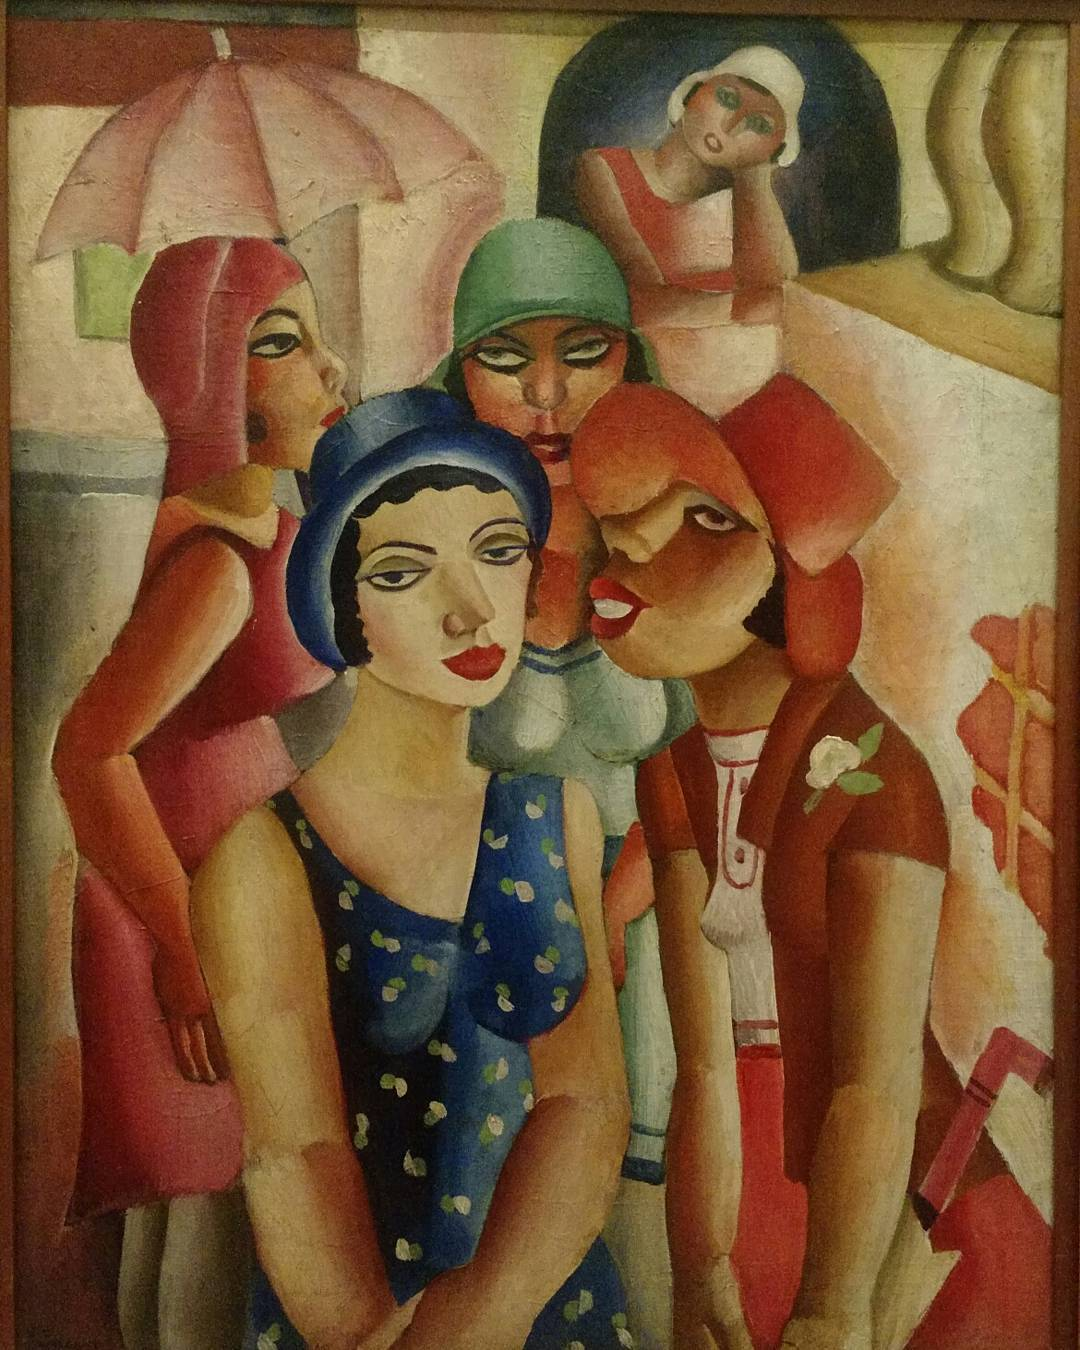 Cinco Moças de Guaratinguetá, 1930